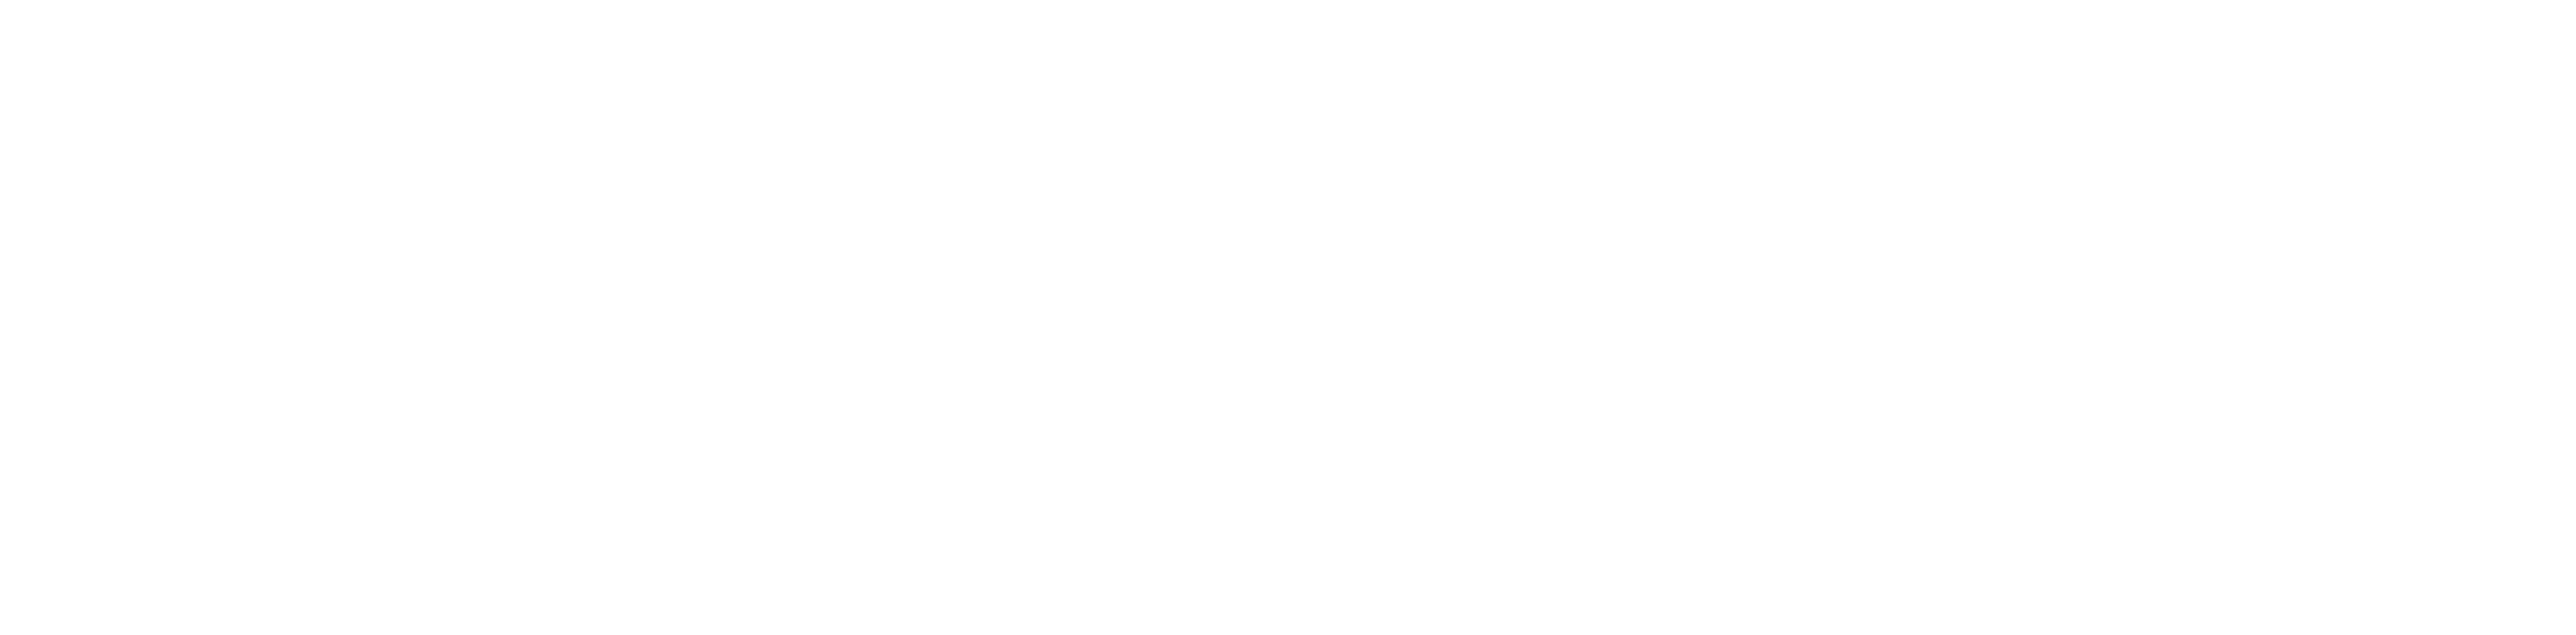 logo_amp1_white